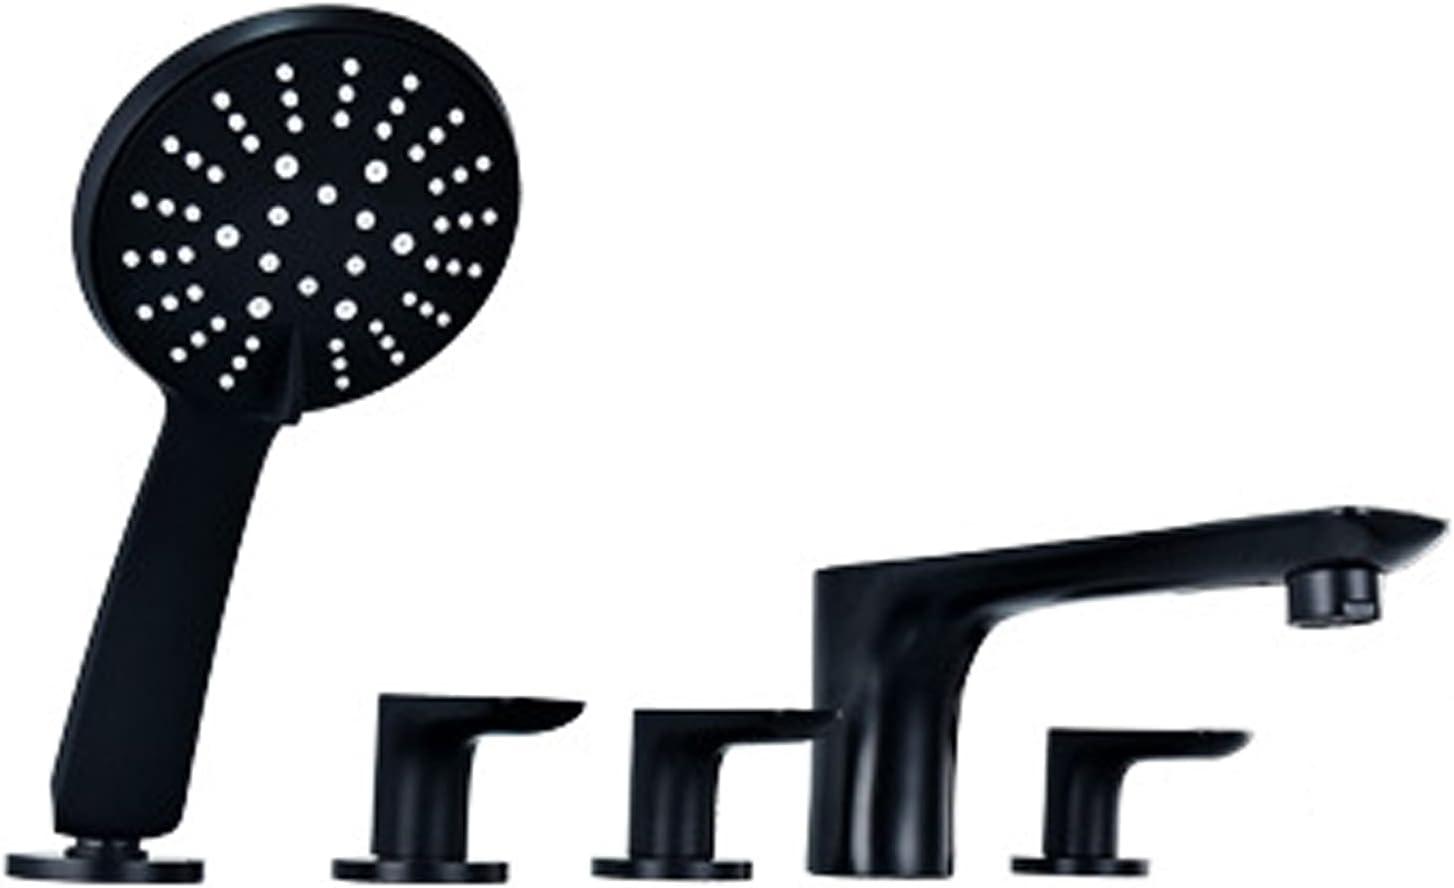 Dealing full price reduction DOTXX Direct sale of manufacturer 5 Holes Tub Filler Deck Black Set Mount Faucet